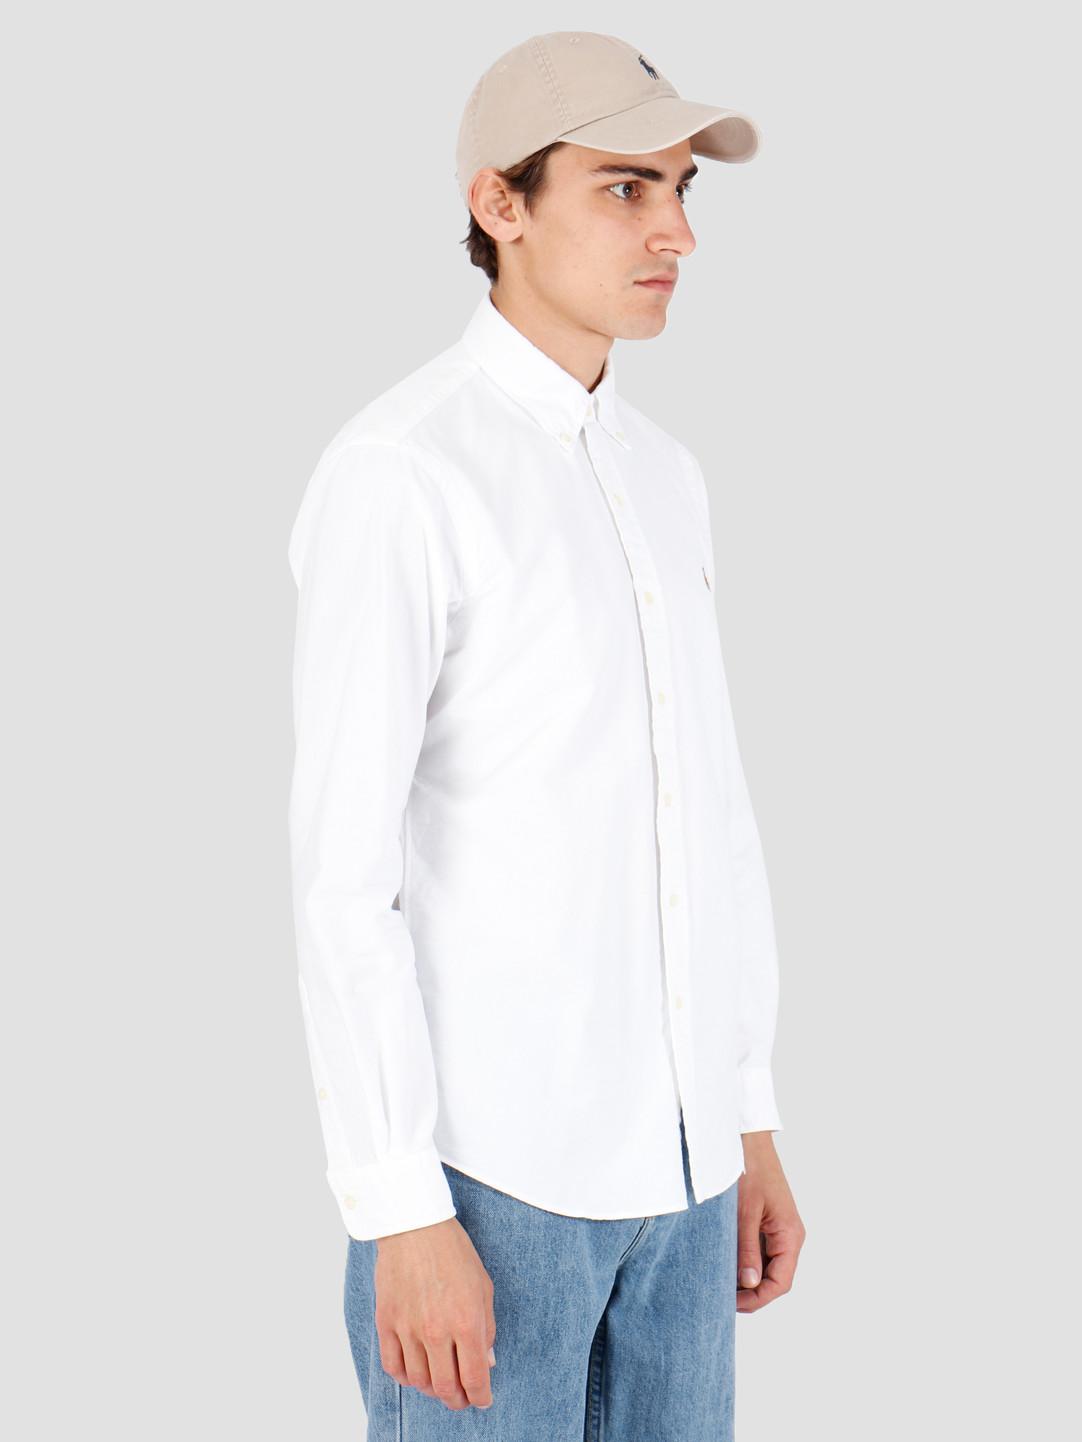 Ralph Lauren Fit Shirt 710548535001 Polo Classic White 43RjL5Aq